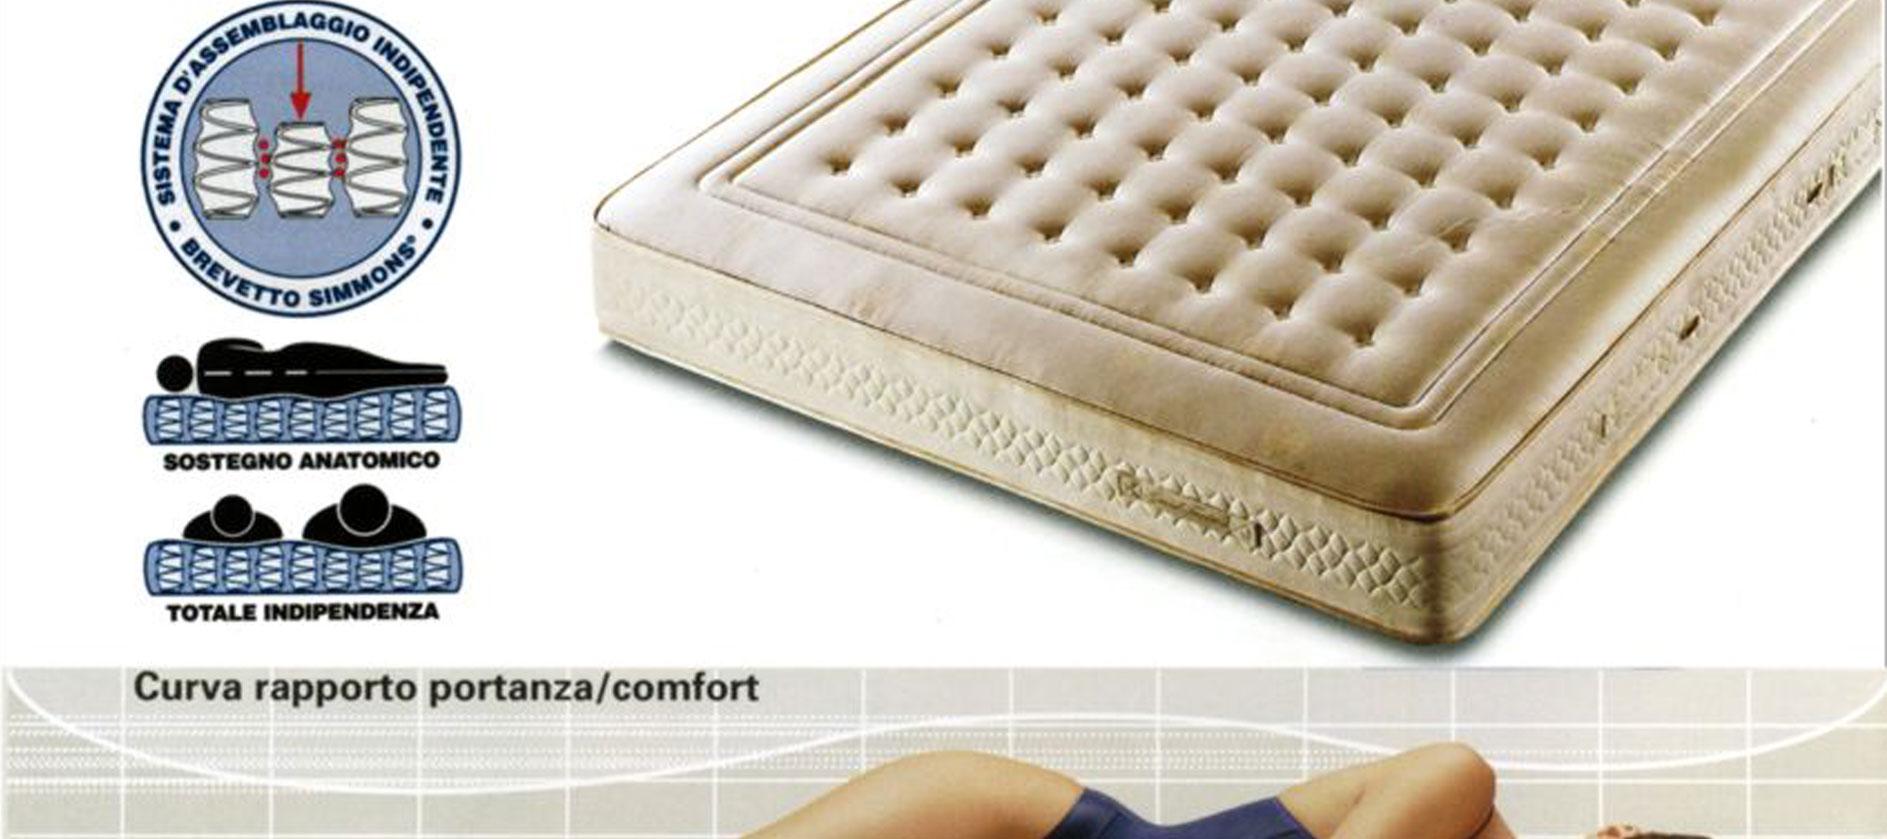 Punto Notte vendita materassi anallergici ed ergonomici